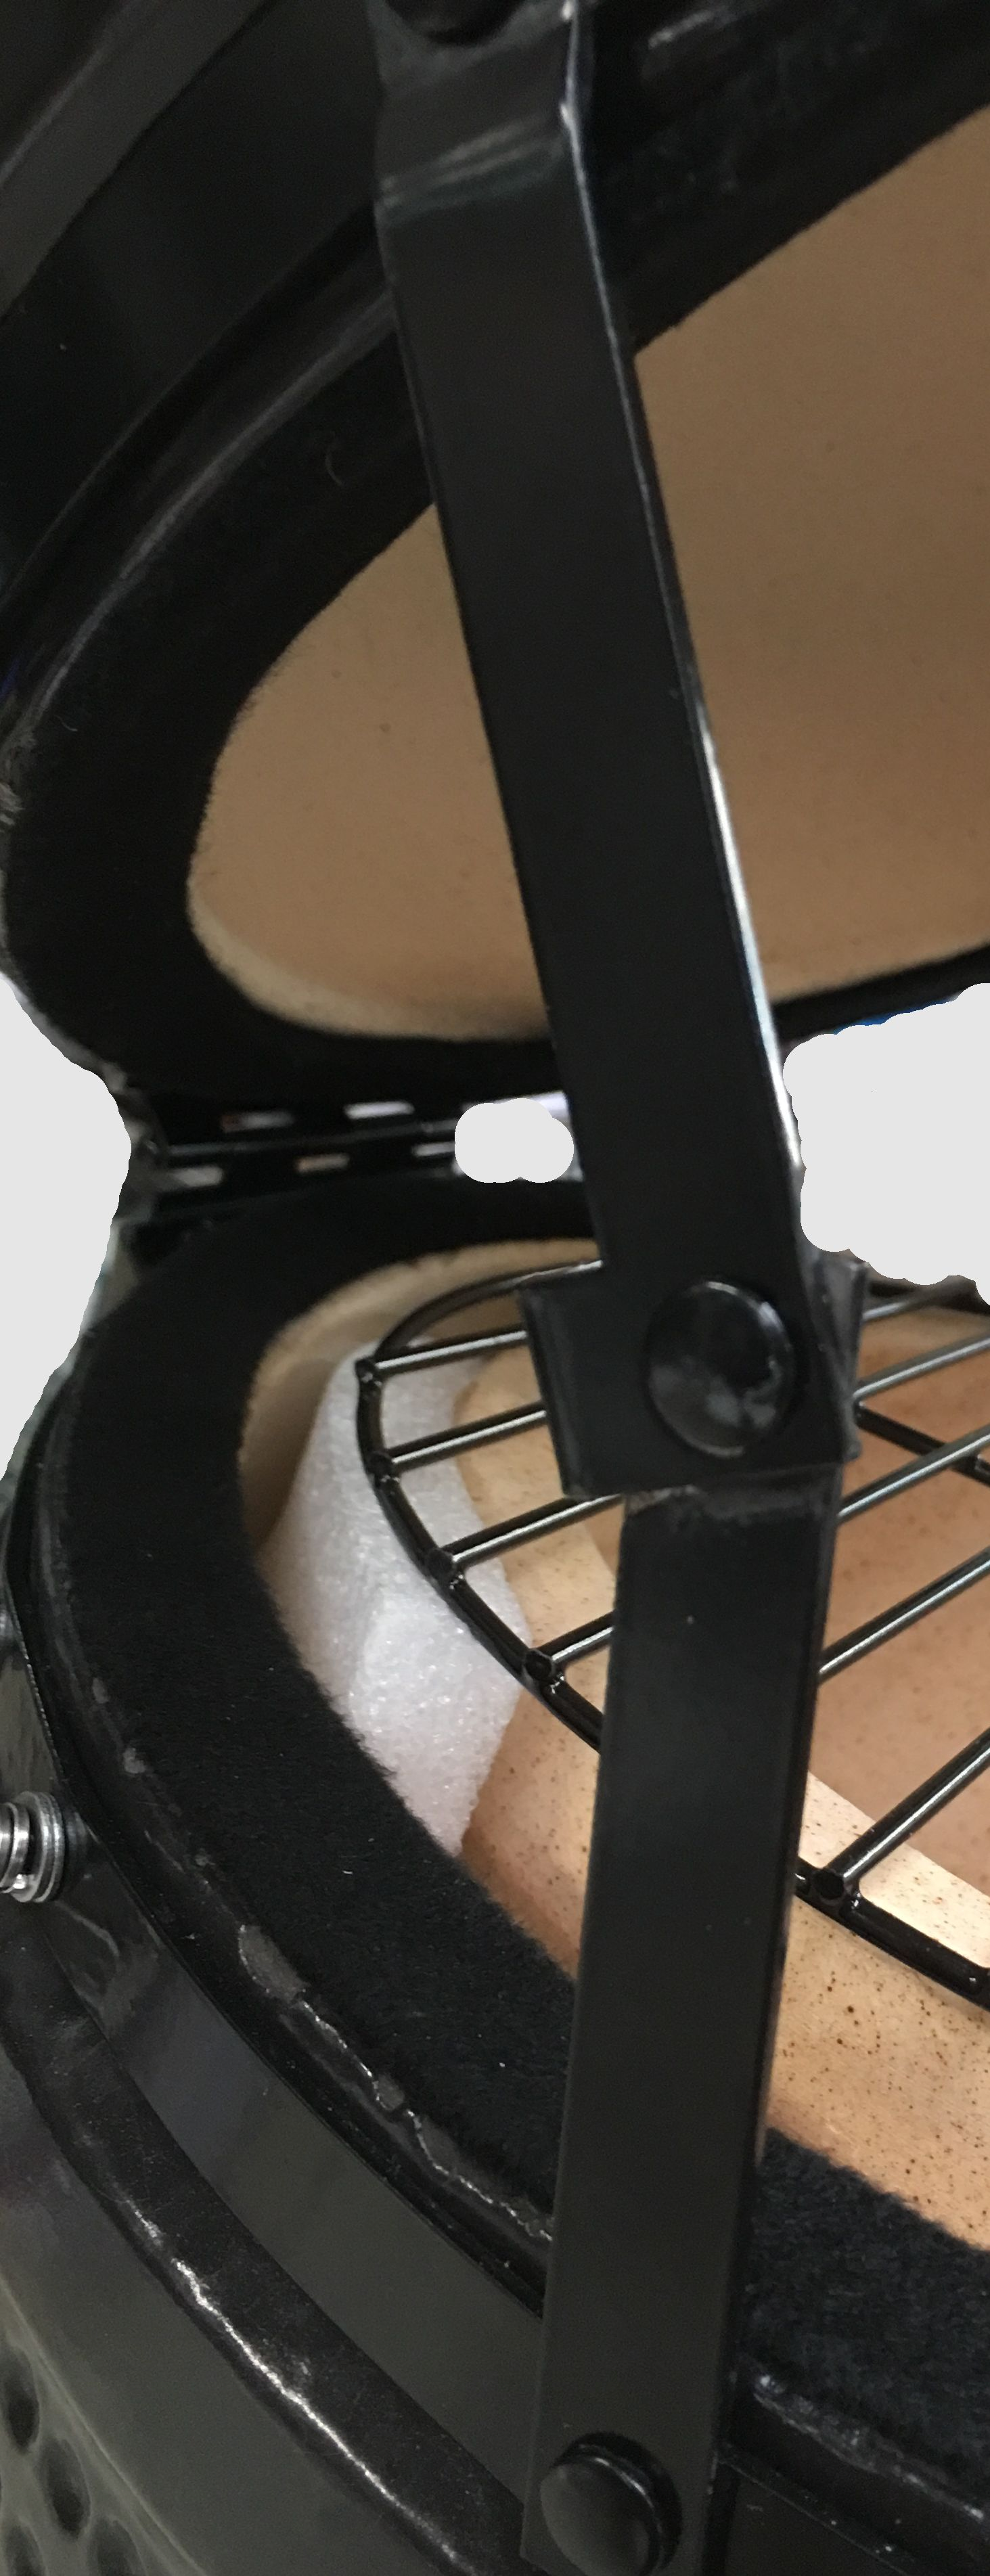 Kamado Action 13-Zoll schwarz Keramikgrill Bild 4